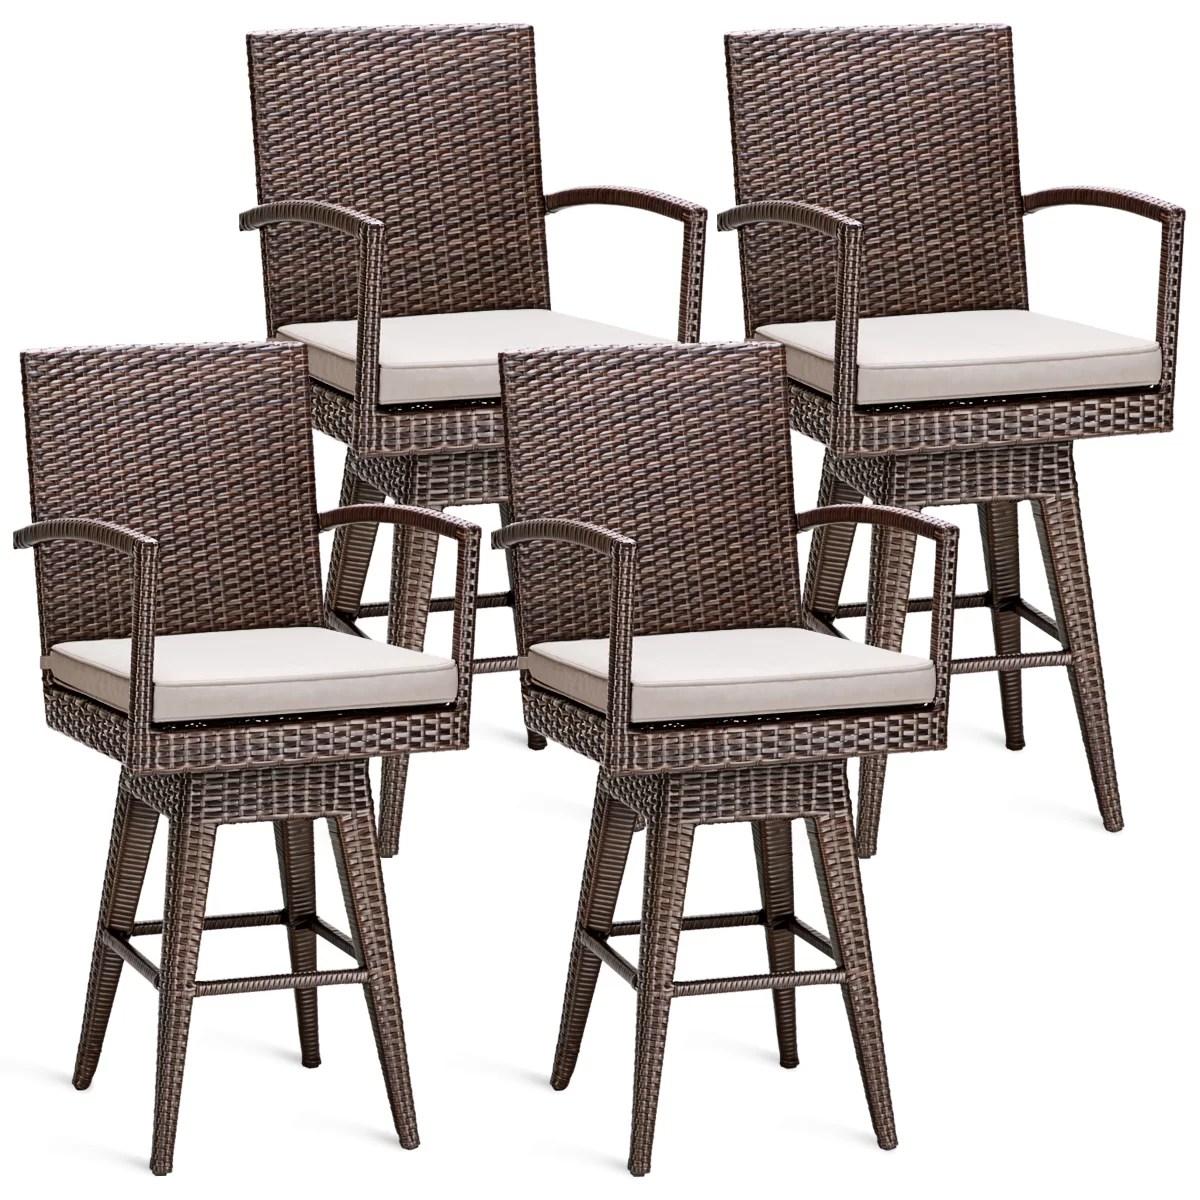 lacourse swivel 26 patio bar stool with cushion